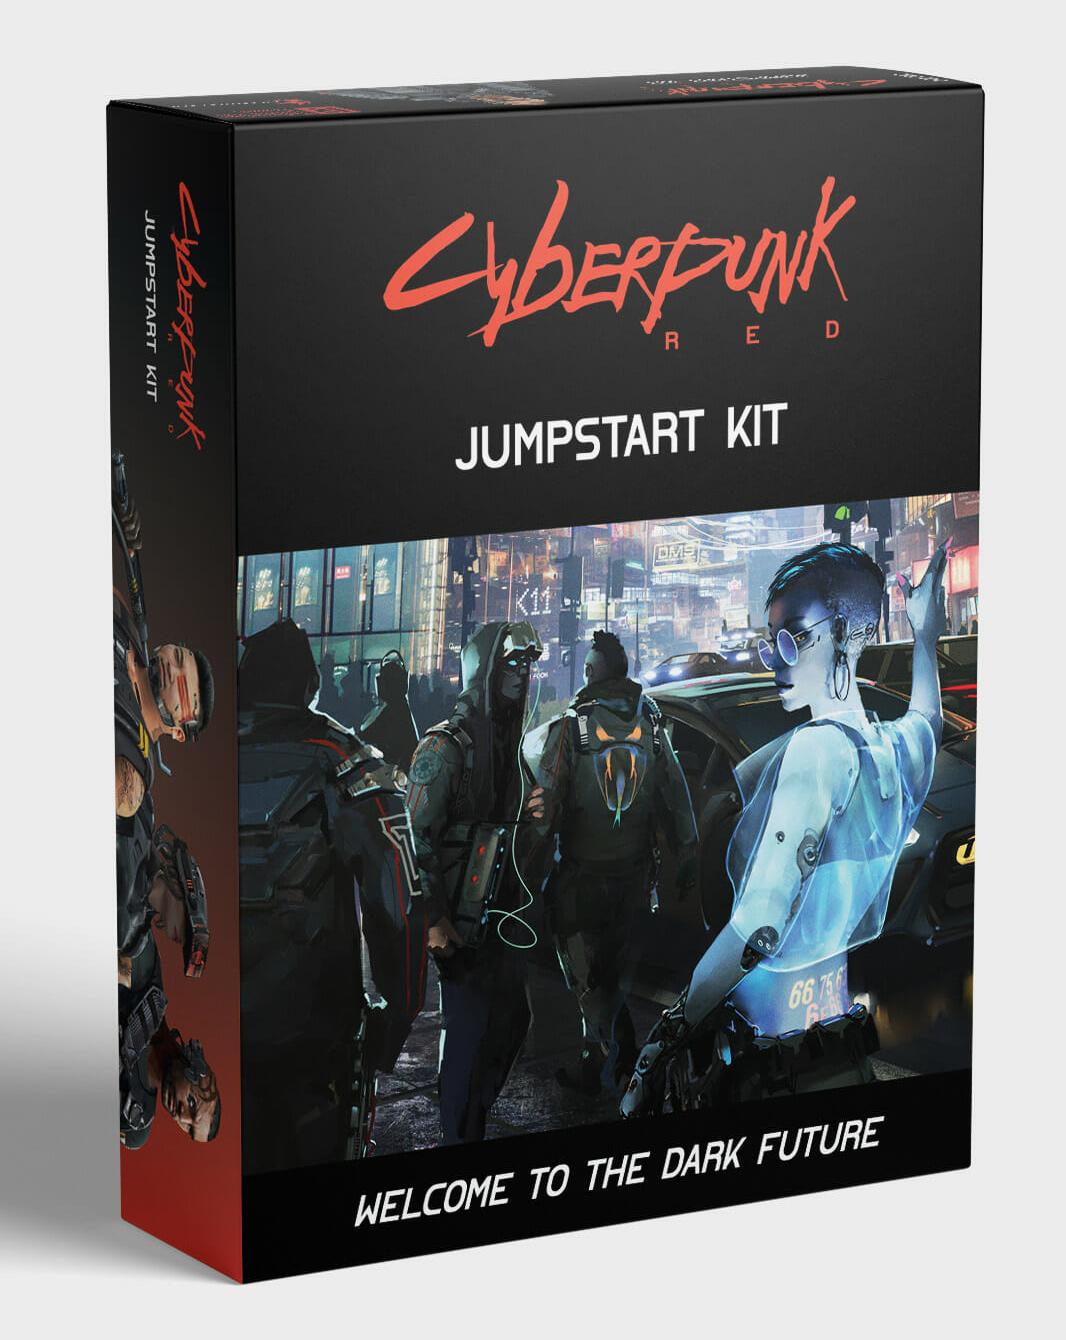 Hobby World издаст на русском Cyberpunk RED — и стартер, и книгу правил 1